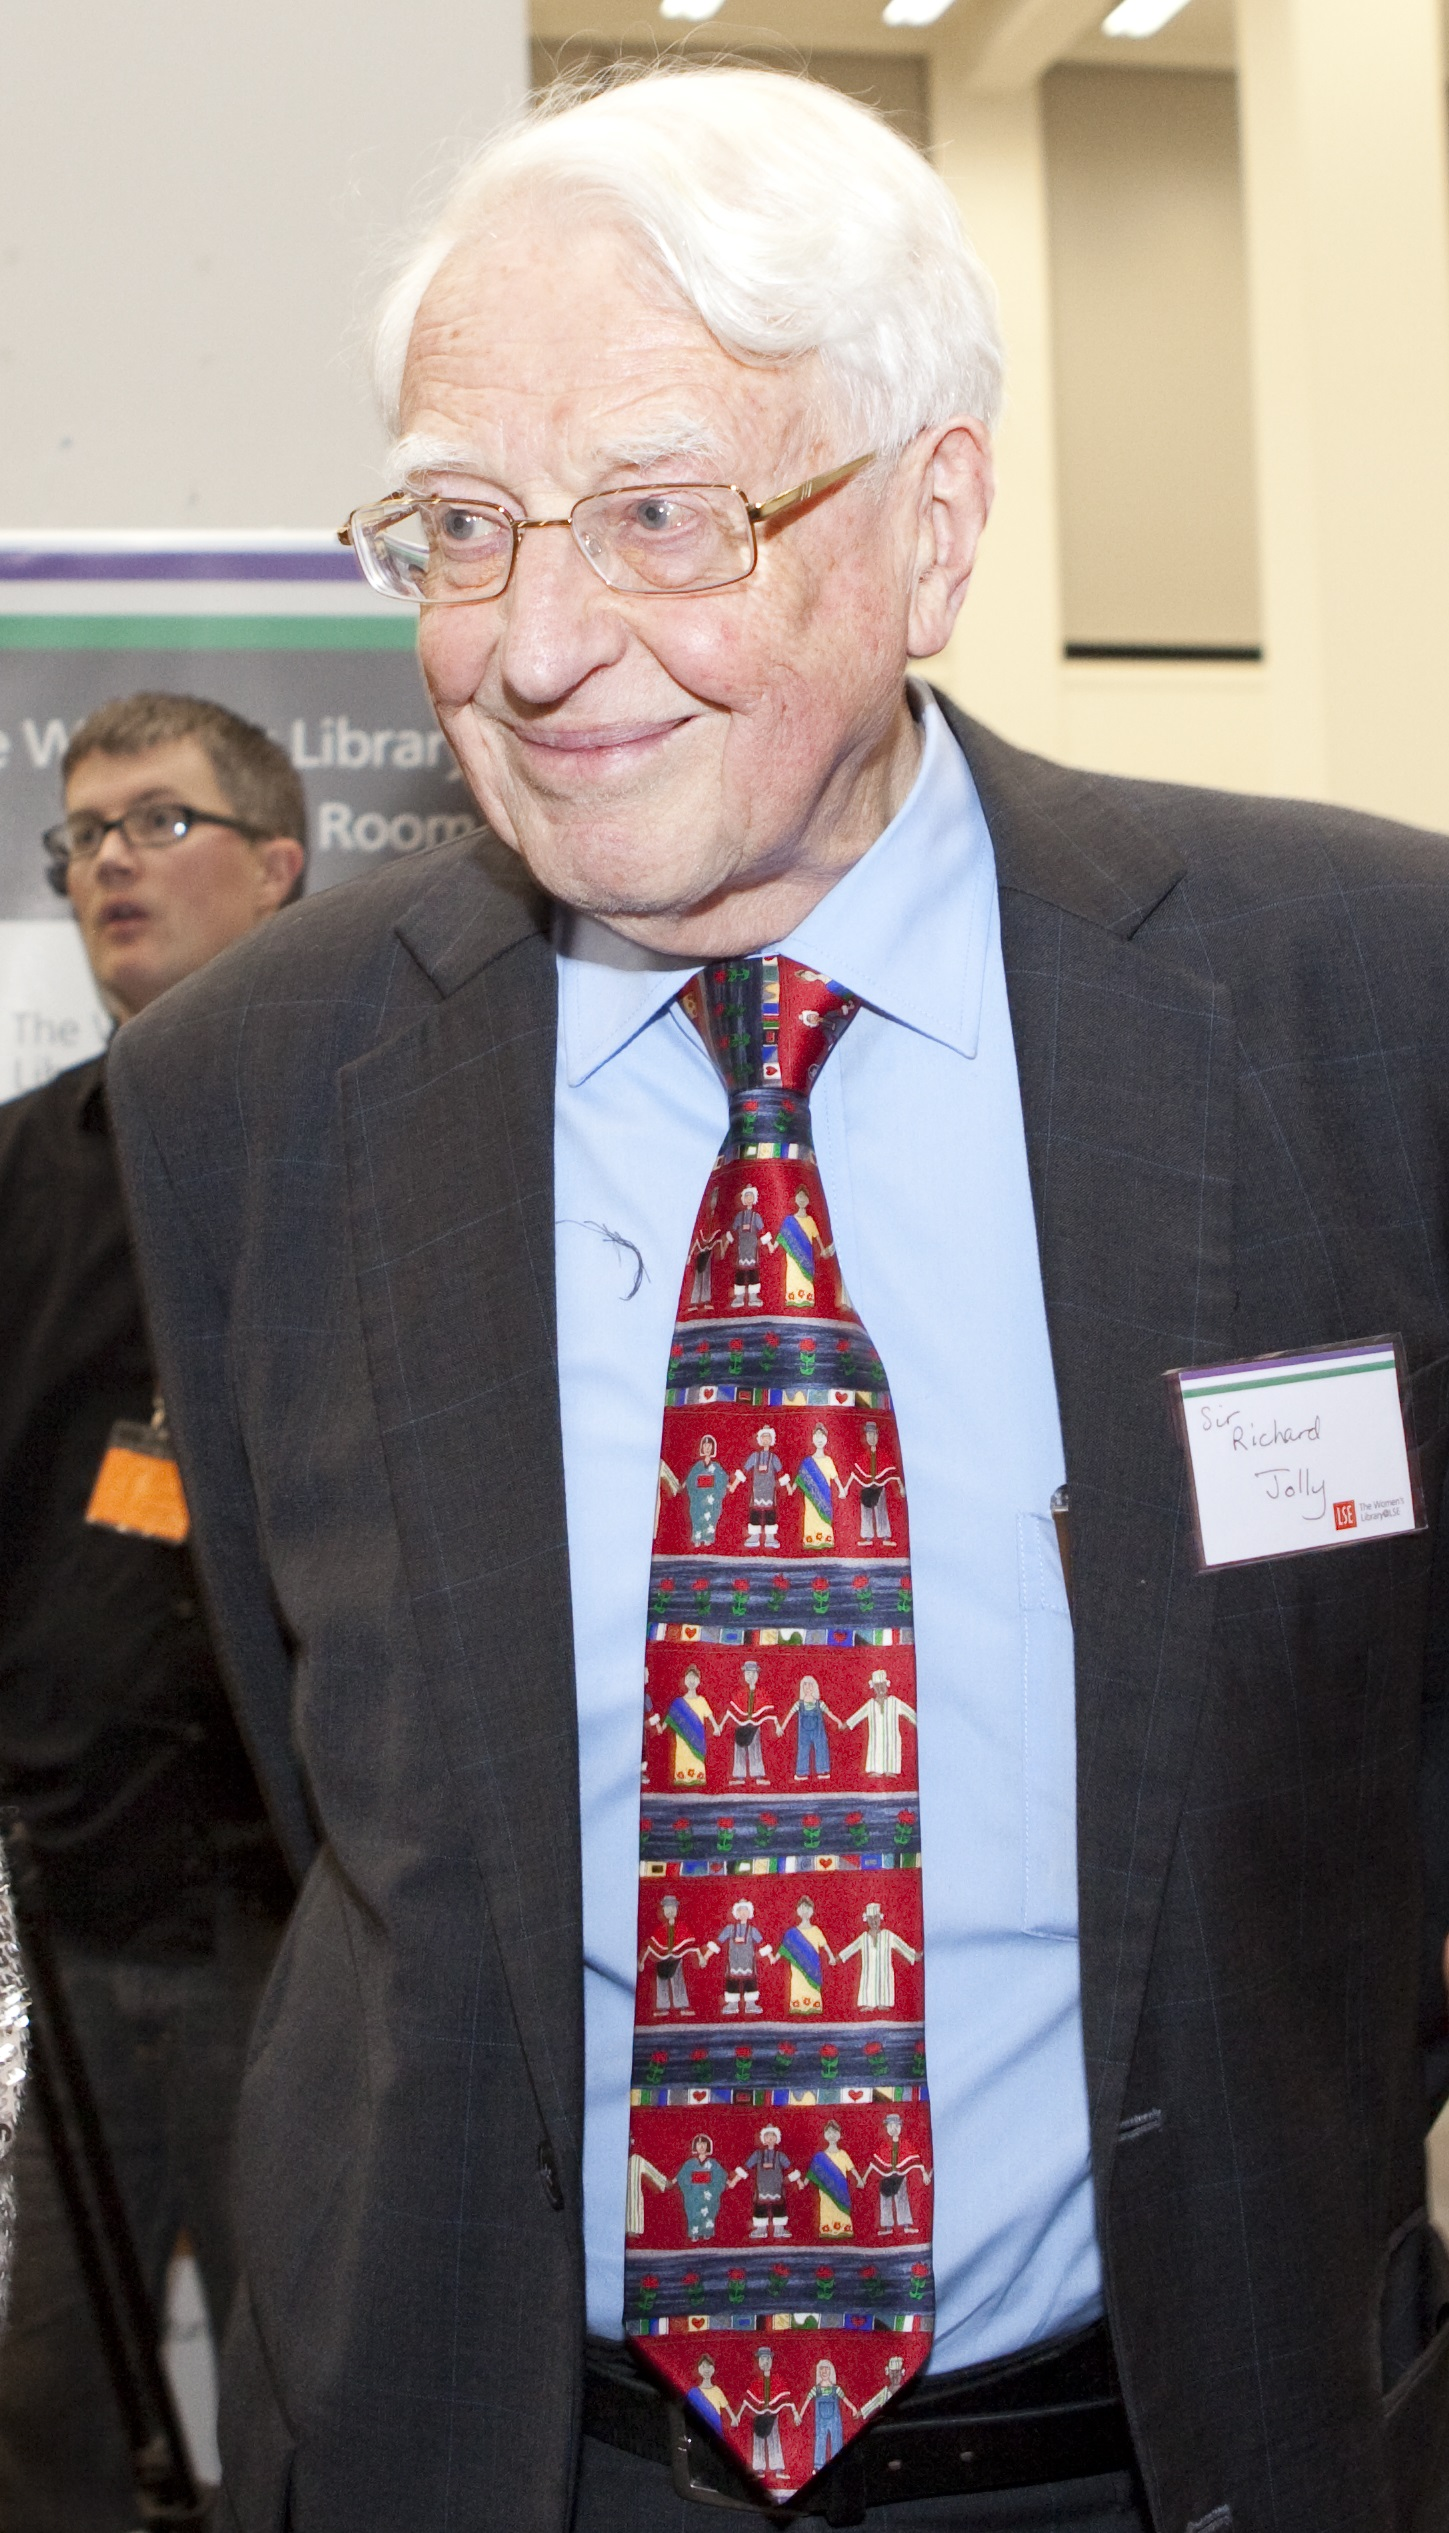 Richard Jolly